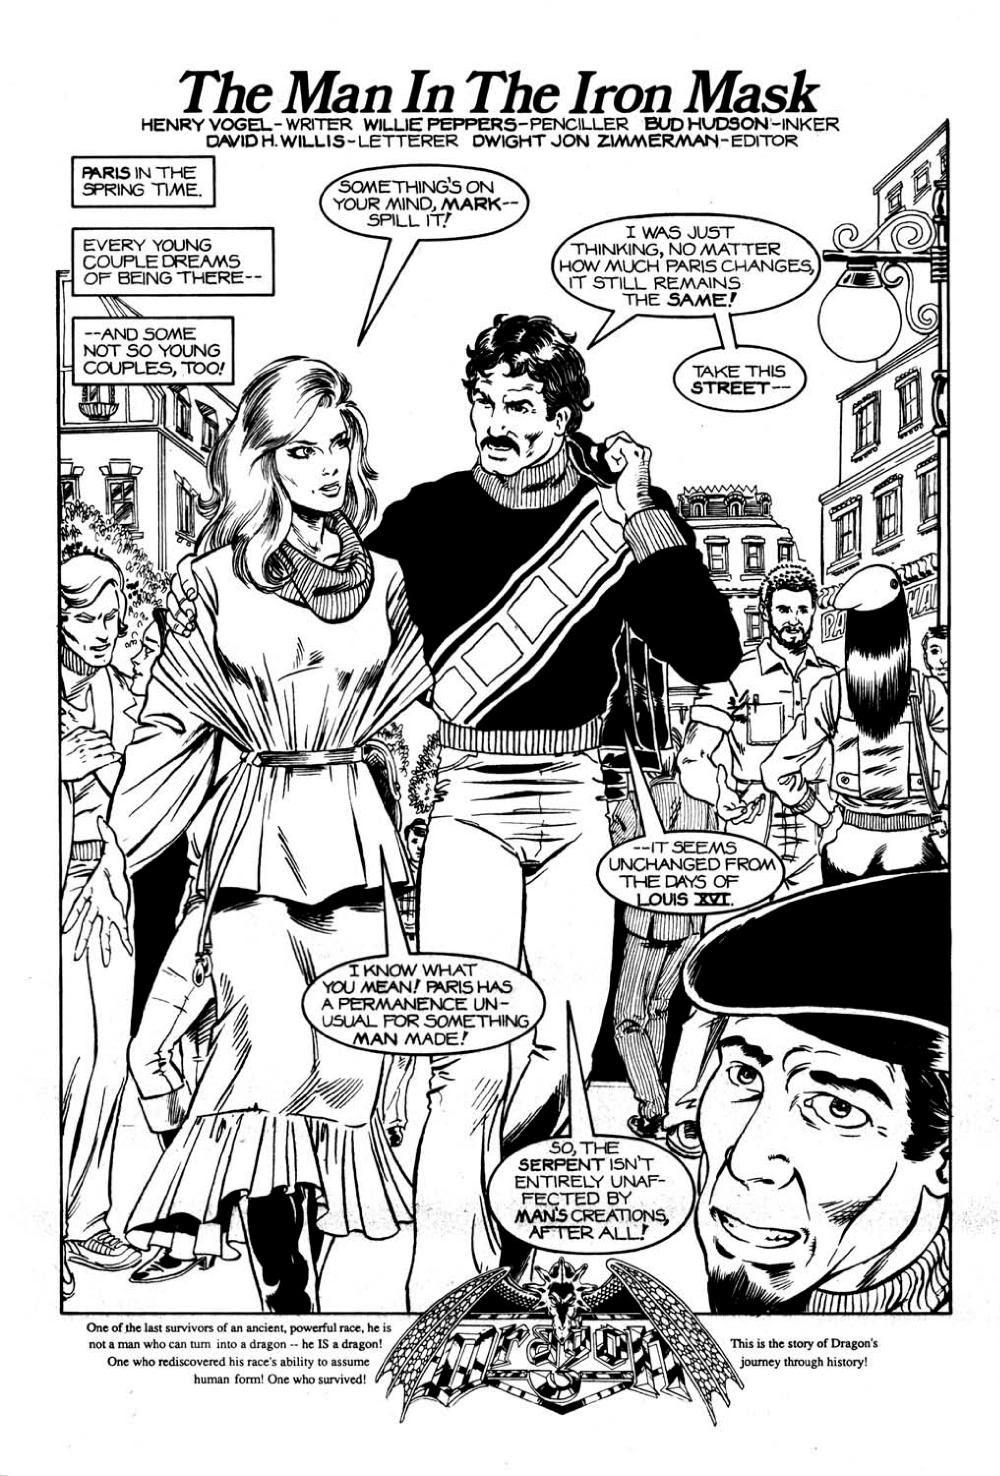 Dragon #2 - Read Dragon Issue #2 Page 3